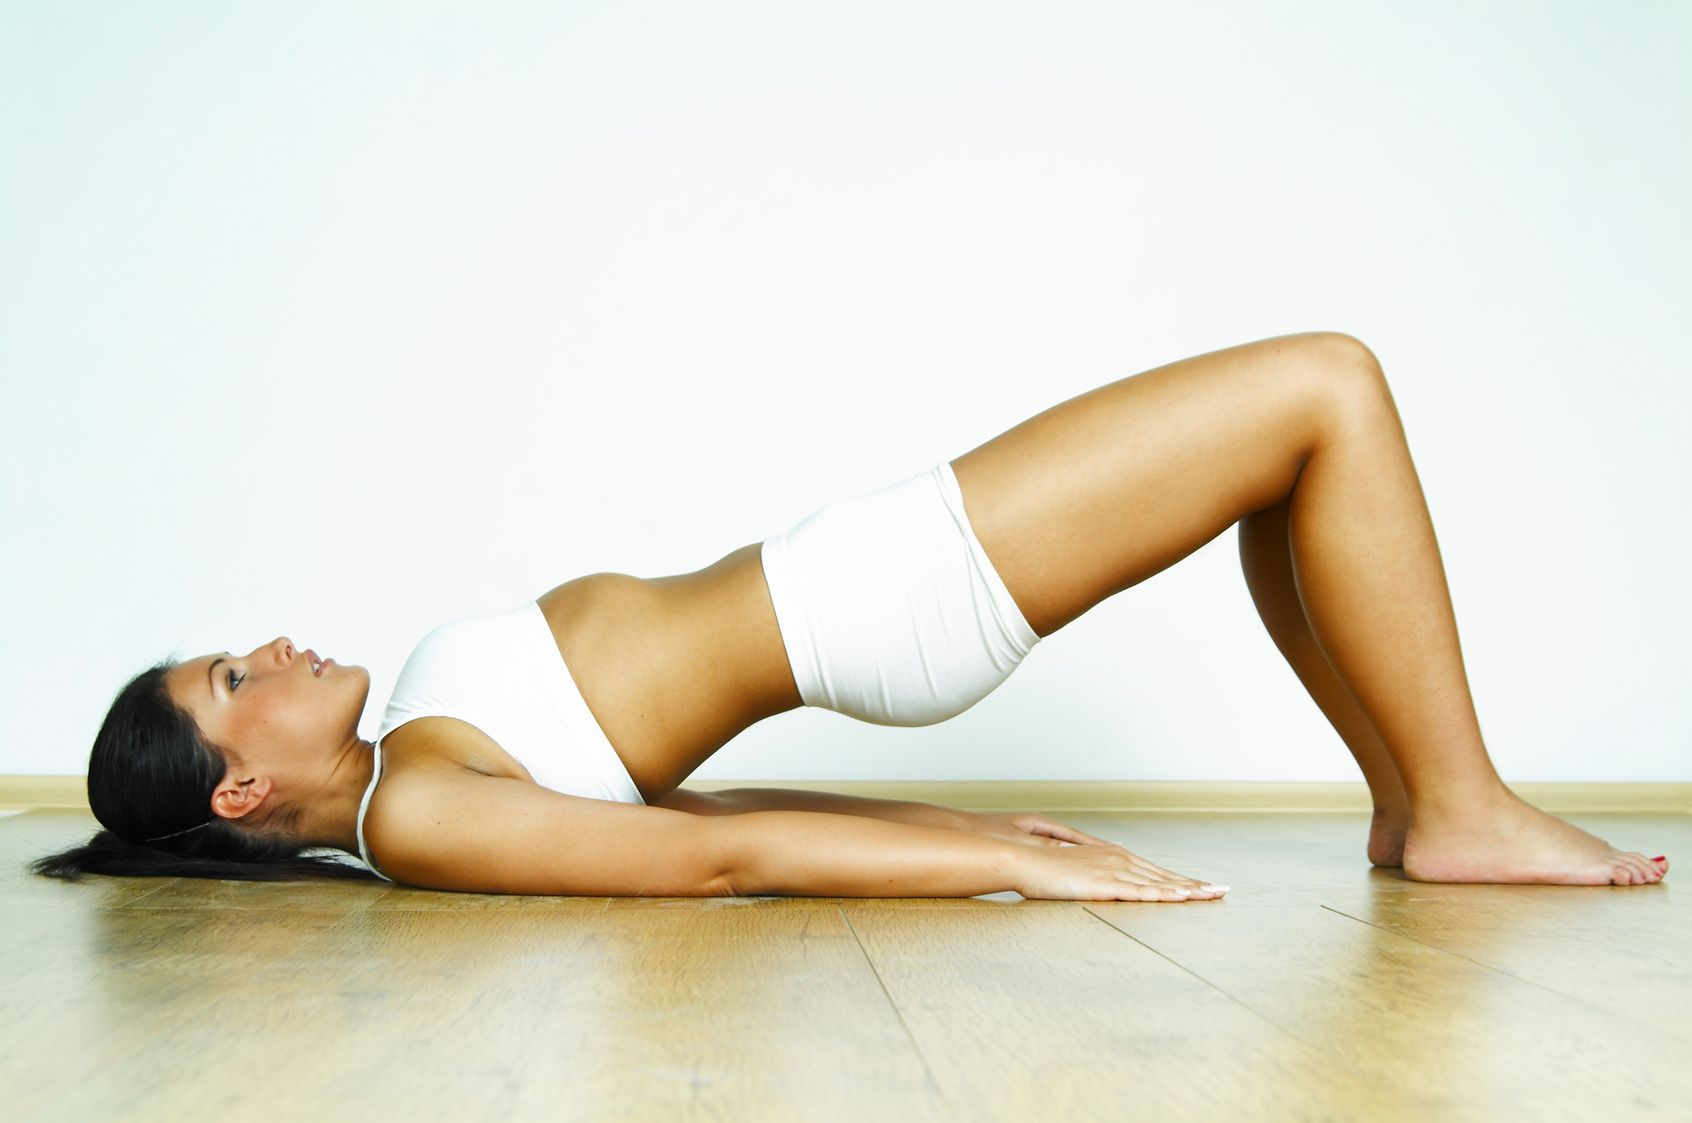 Лечебная гимнастика от сколиоза — как достичь результата